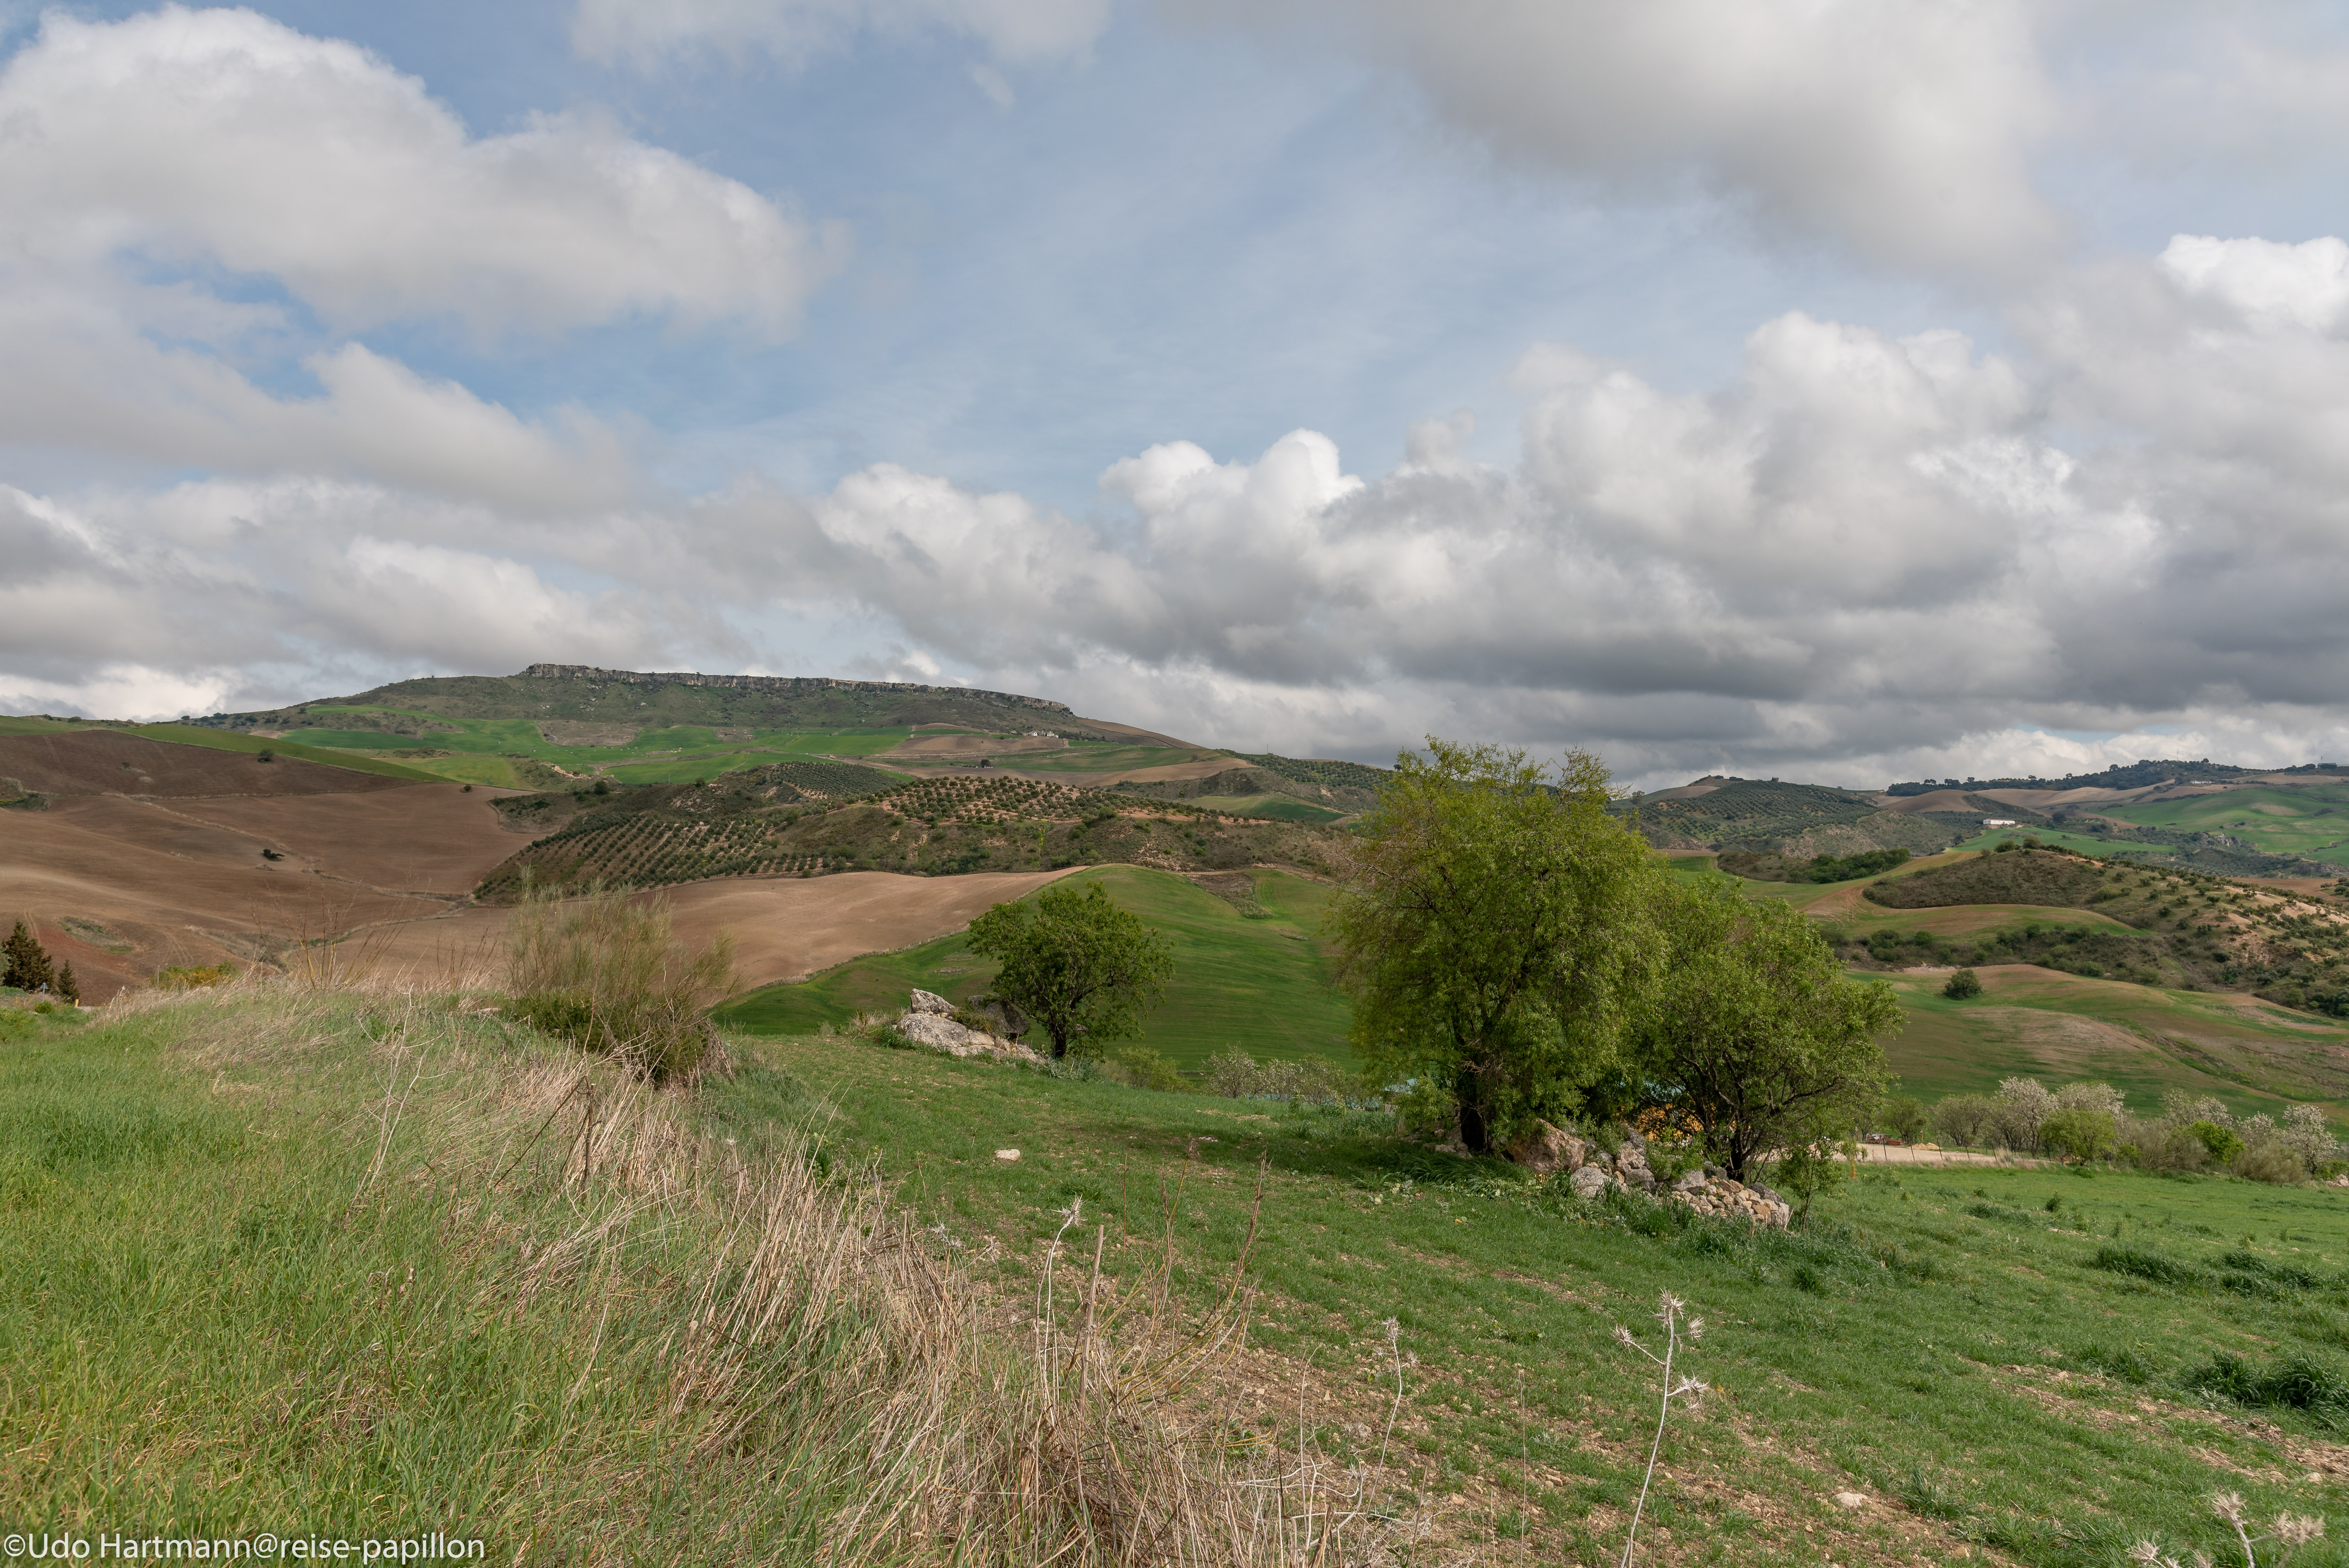 In der Sierra de Grazalema